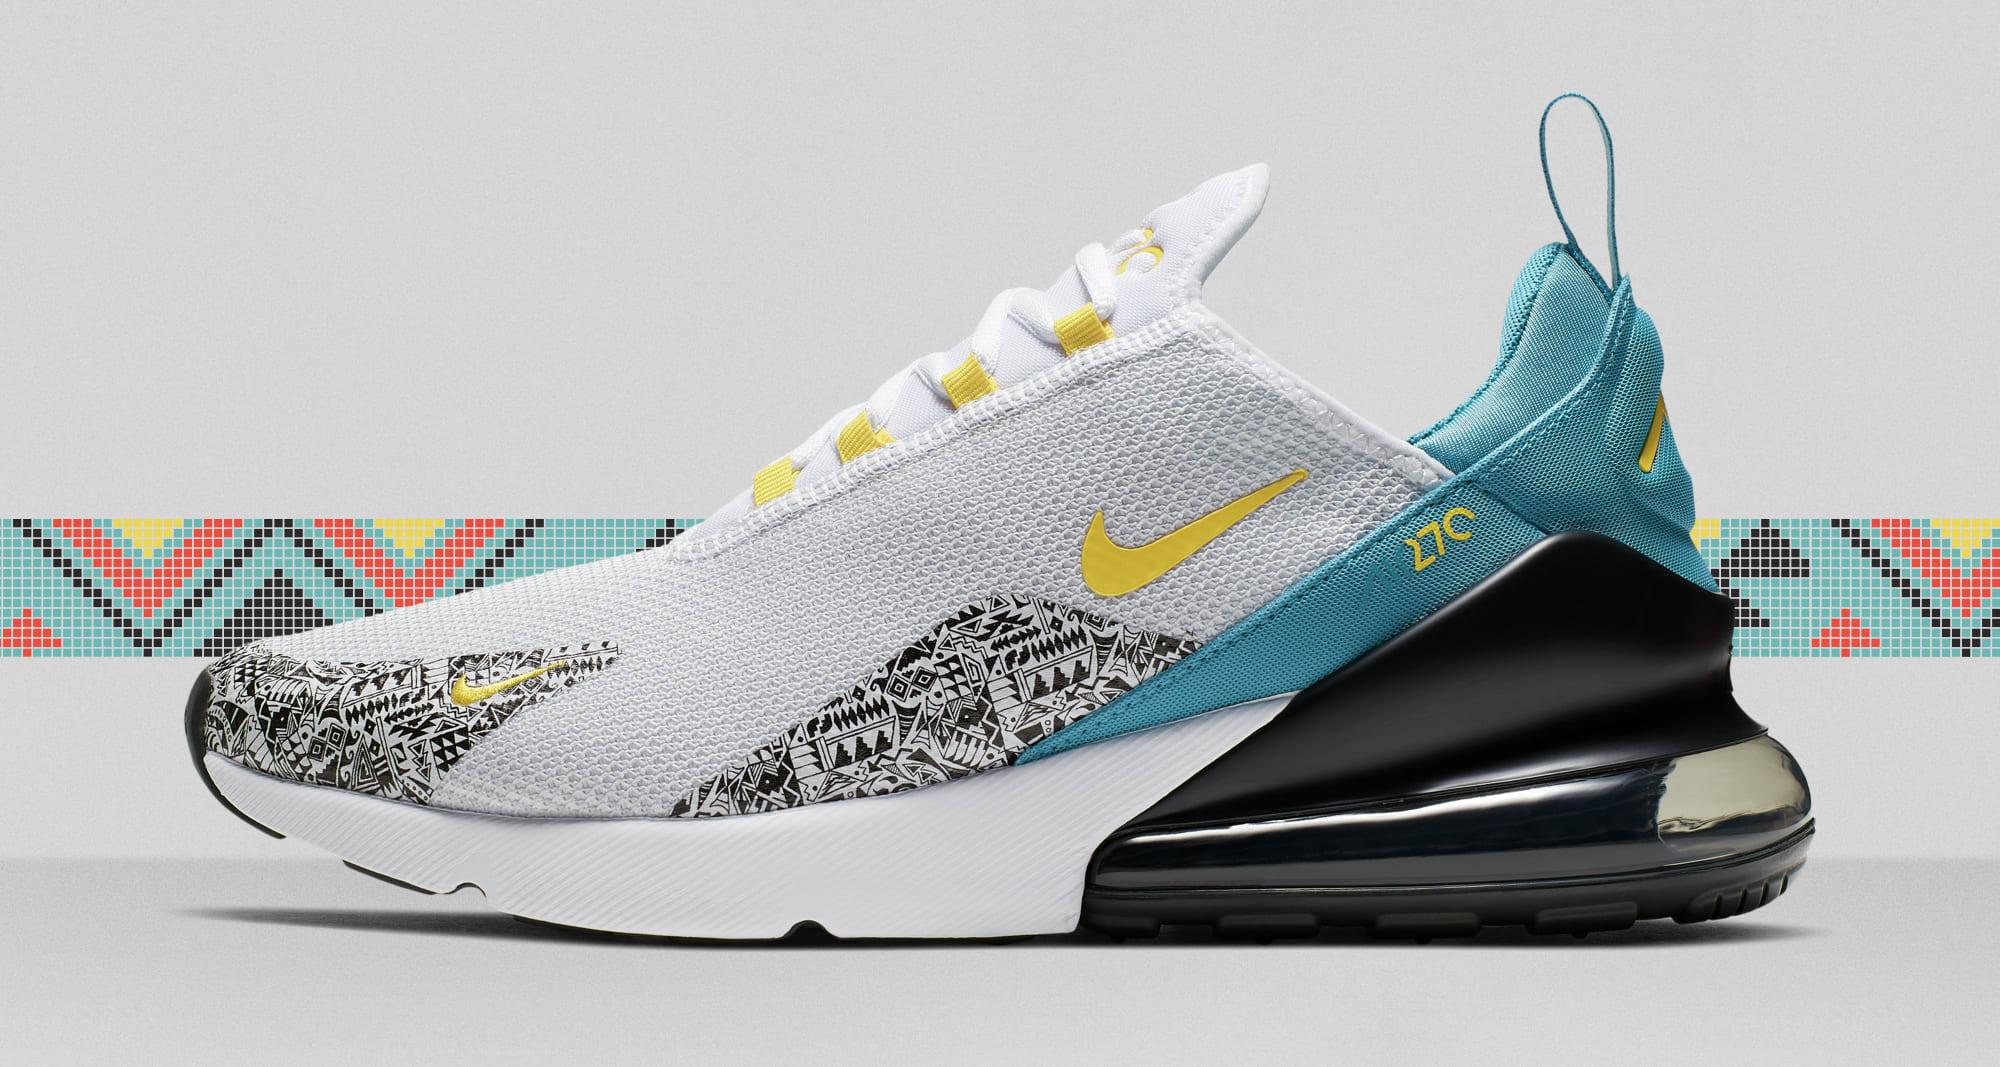 Nike N7 Collection Summer 2019 Air Max 270